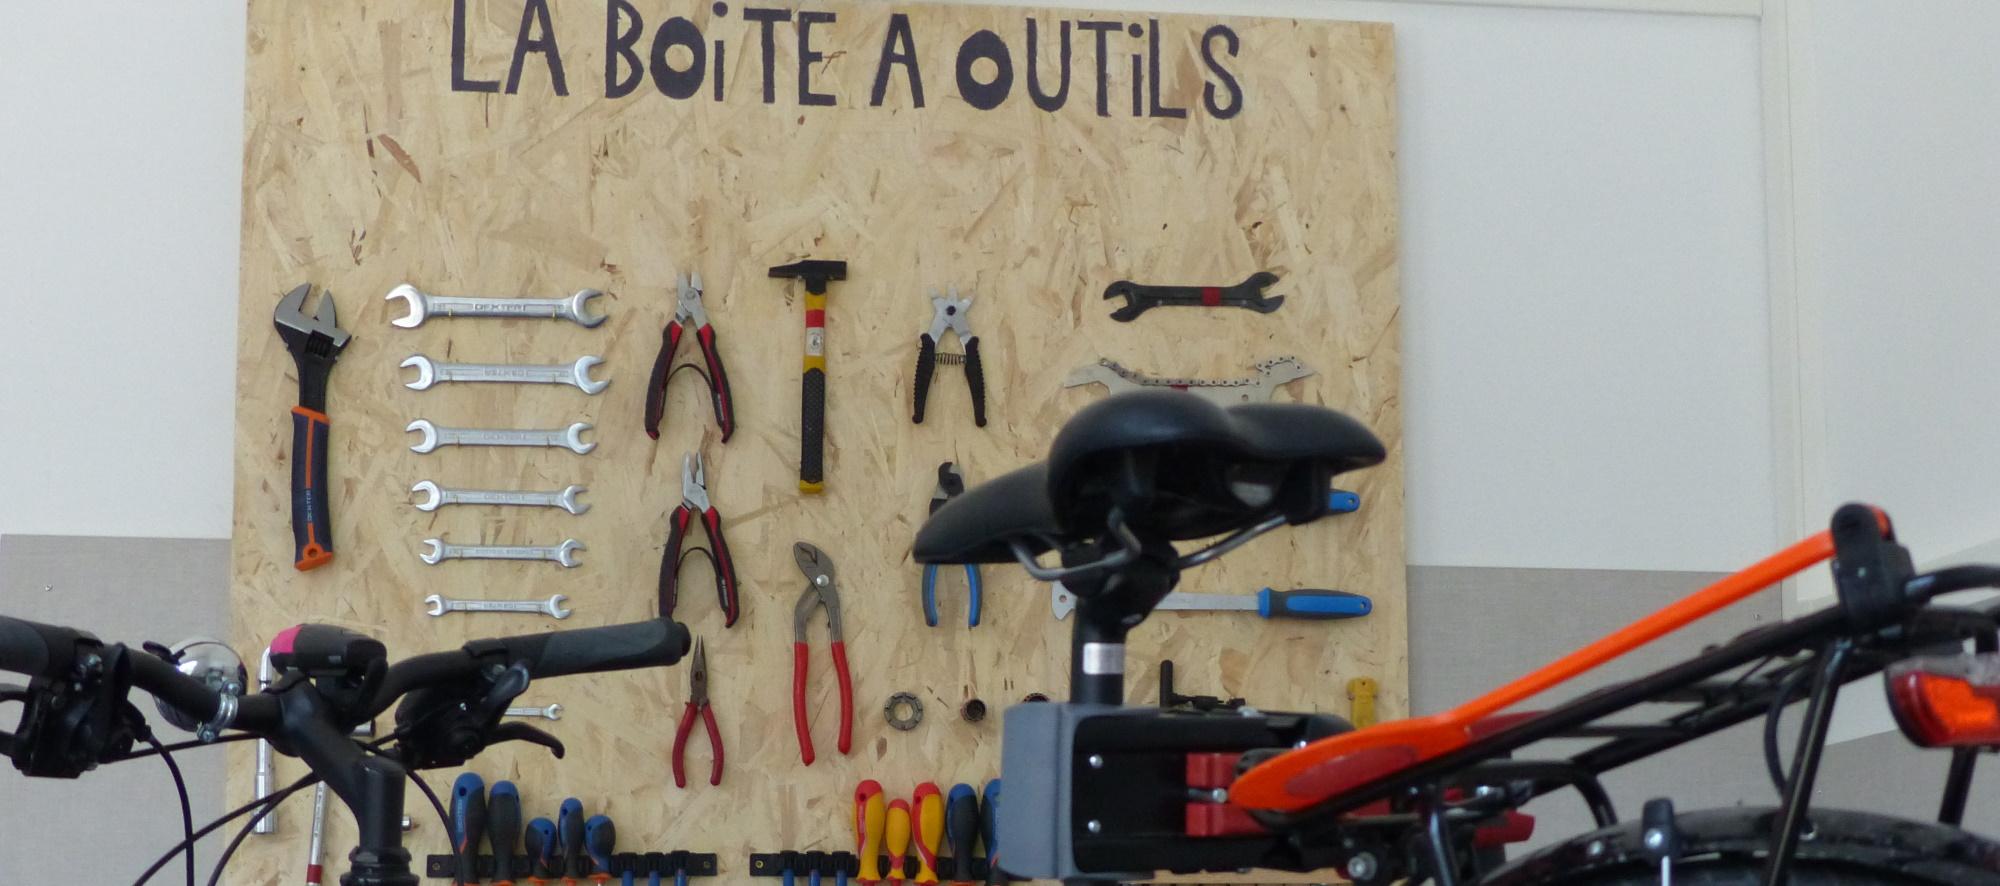 Maison_Velo_Lyon_boite_outils_entreprises